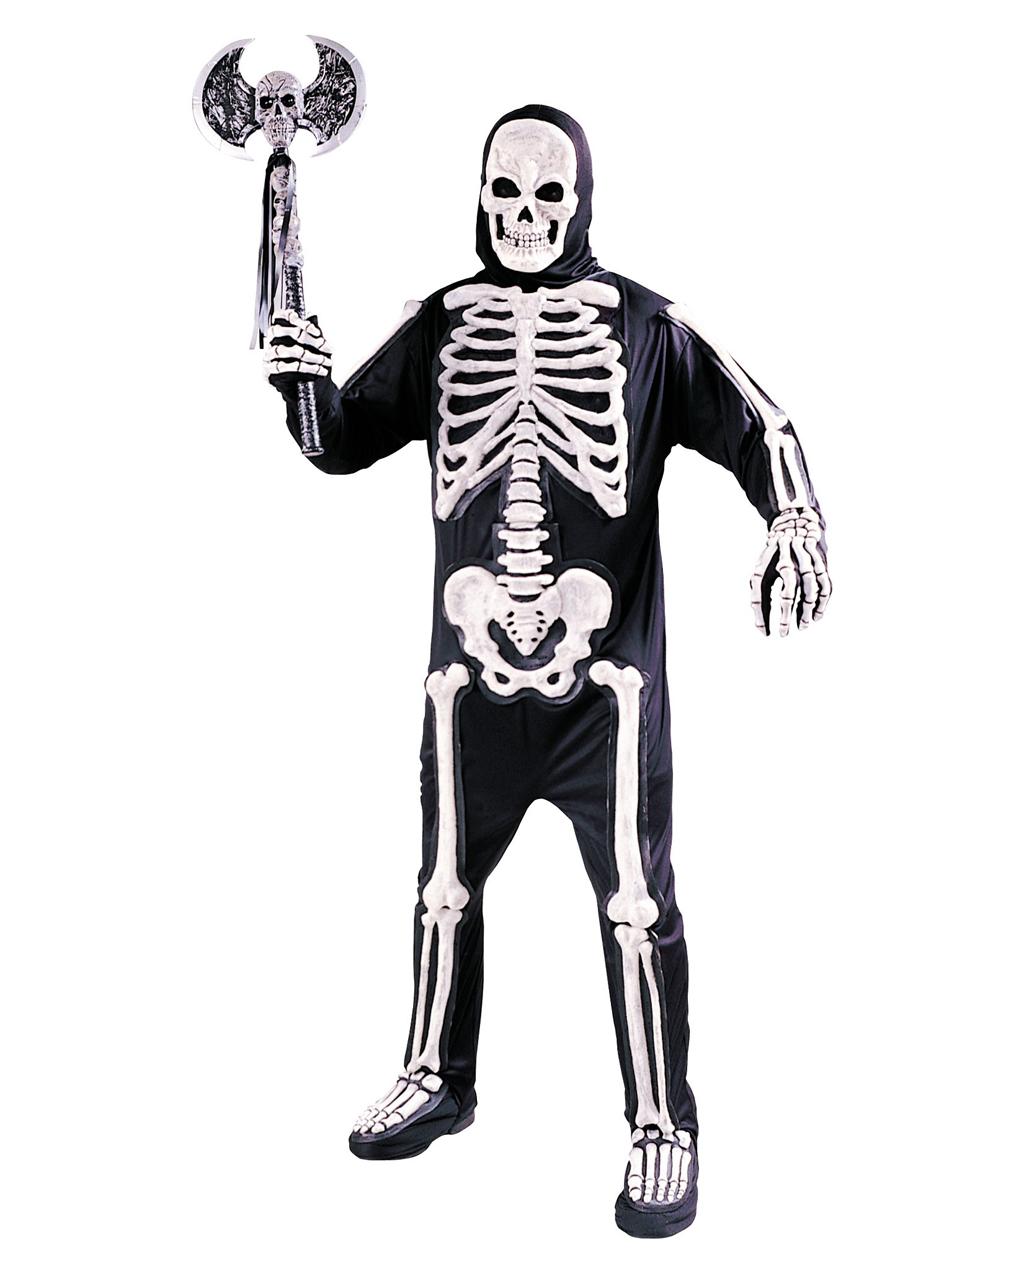 3D Skeleton Costume Adult as bone skeleton for Halloween | horror-shop.com  sc 1 st  Horror-Shop.com & 3D Skeleton Costume Adult as bone skeleton for Halloween | horror ...